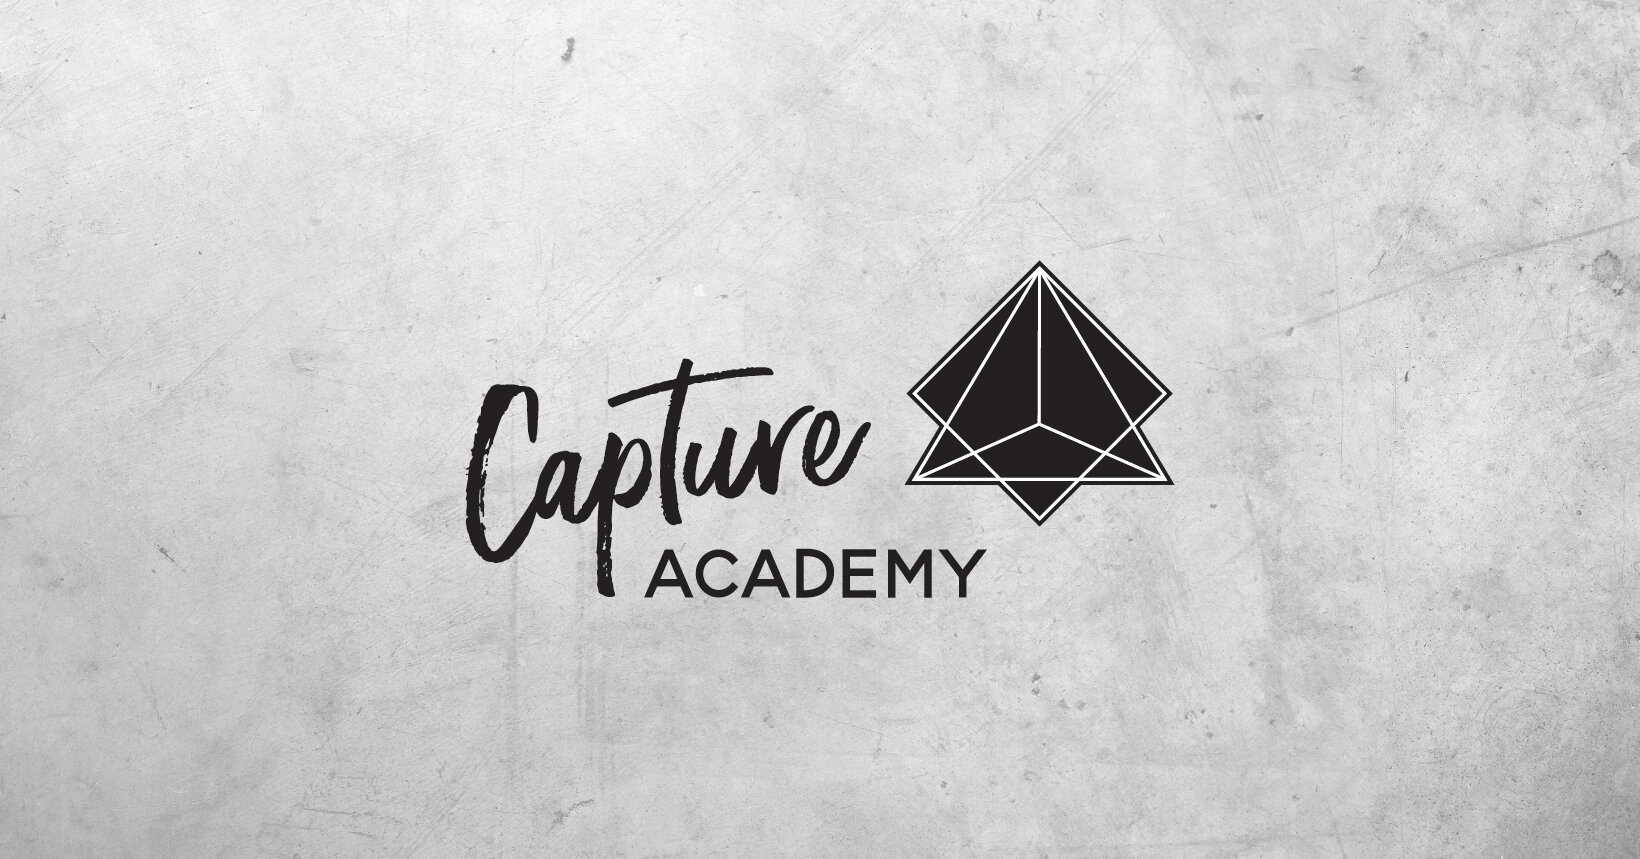 Capture Academy - Caiti Jackson -  Intuitive Brand Designer